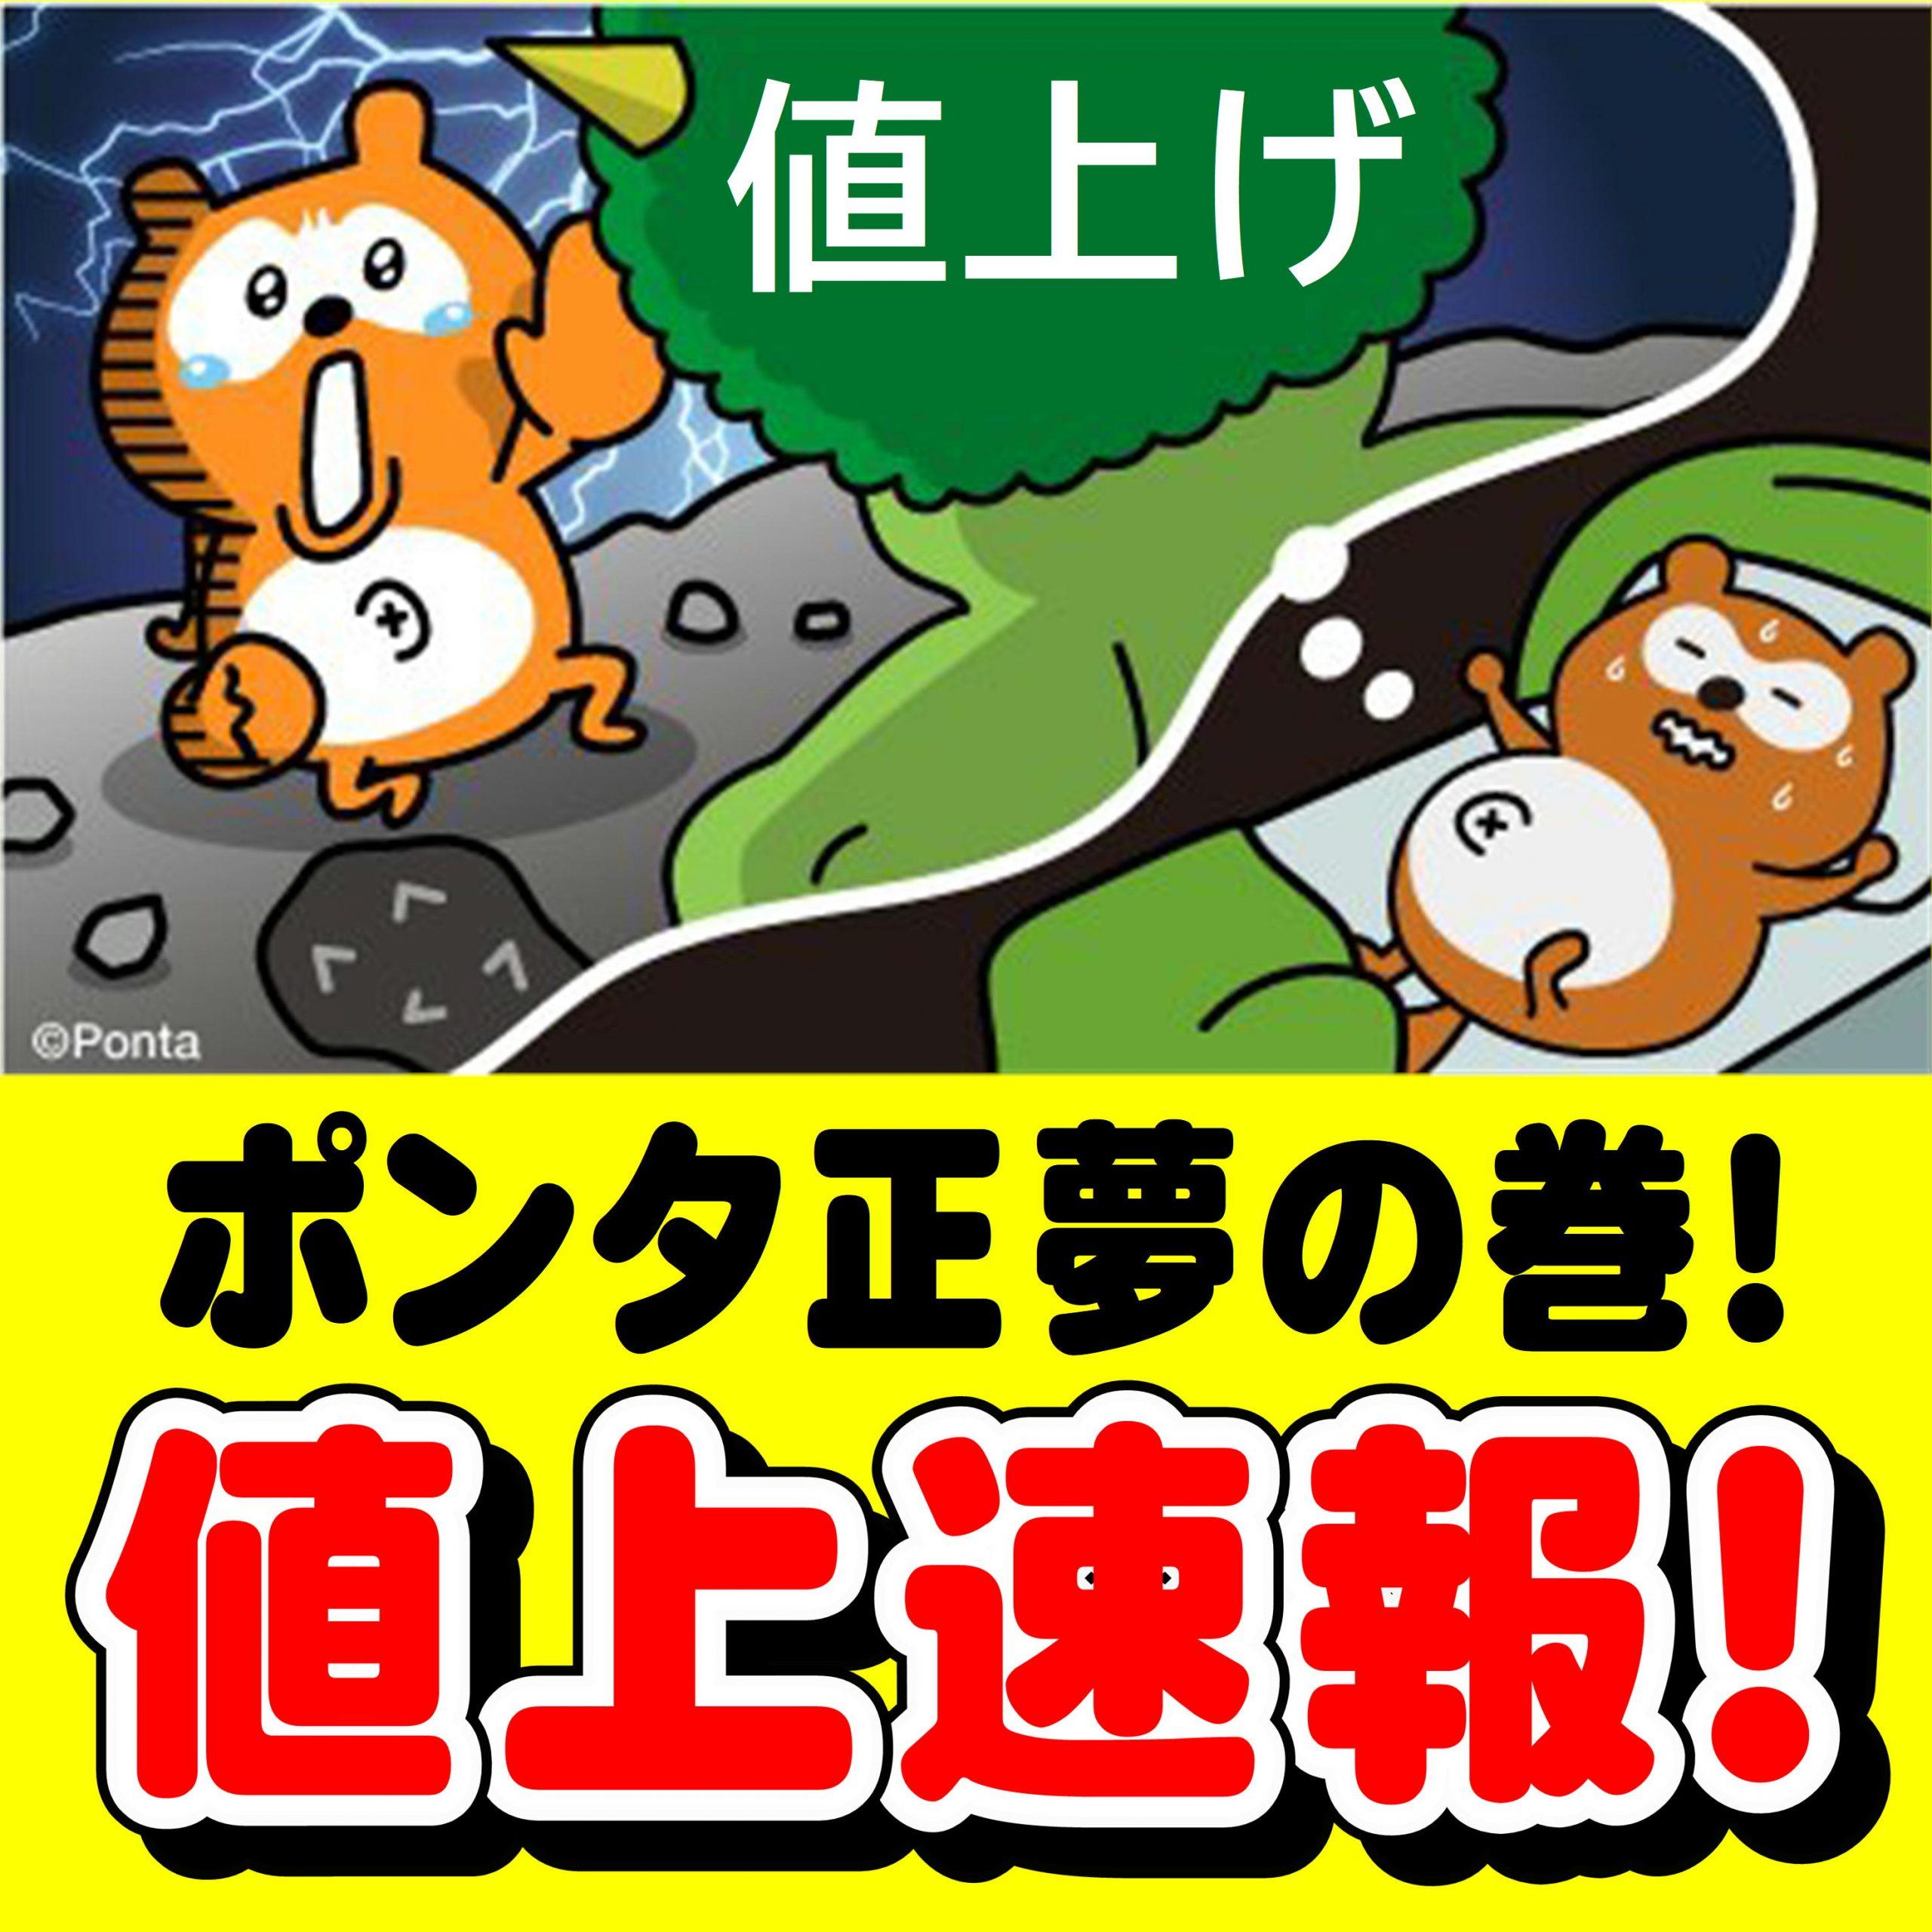 ※緊急値上げ速報!!